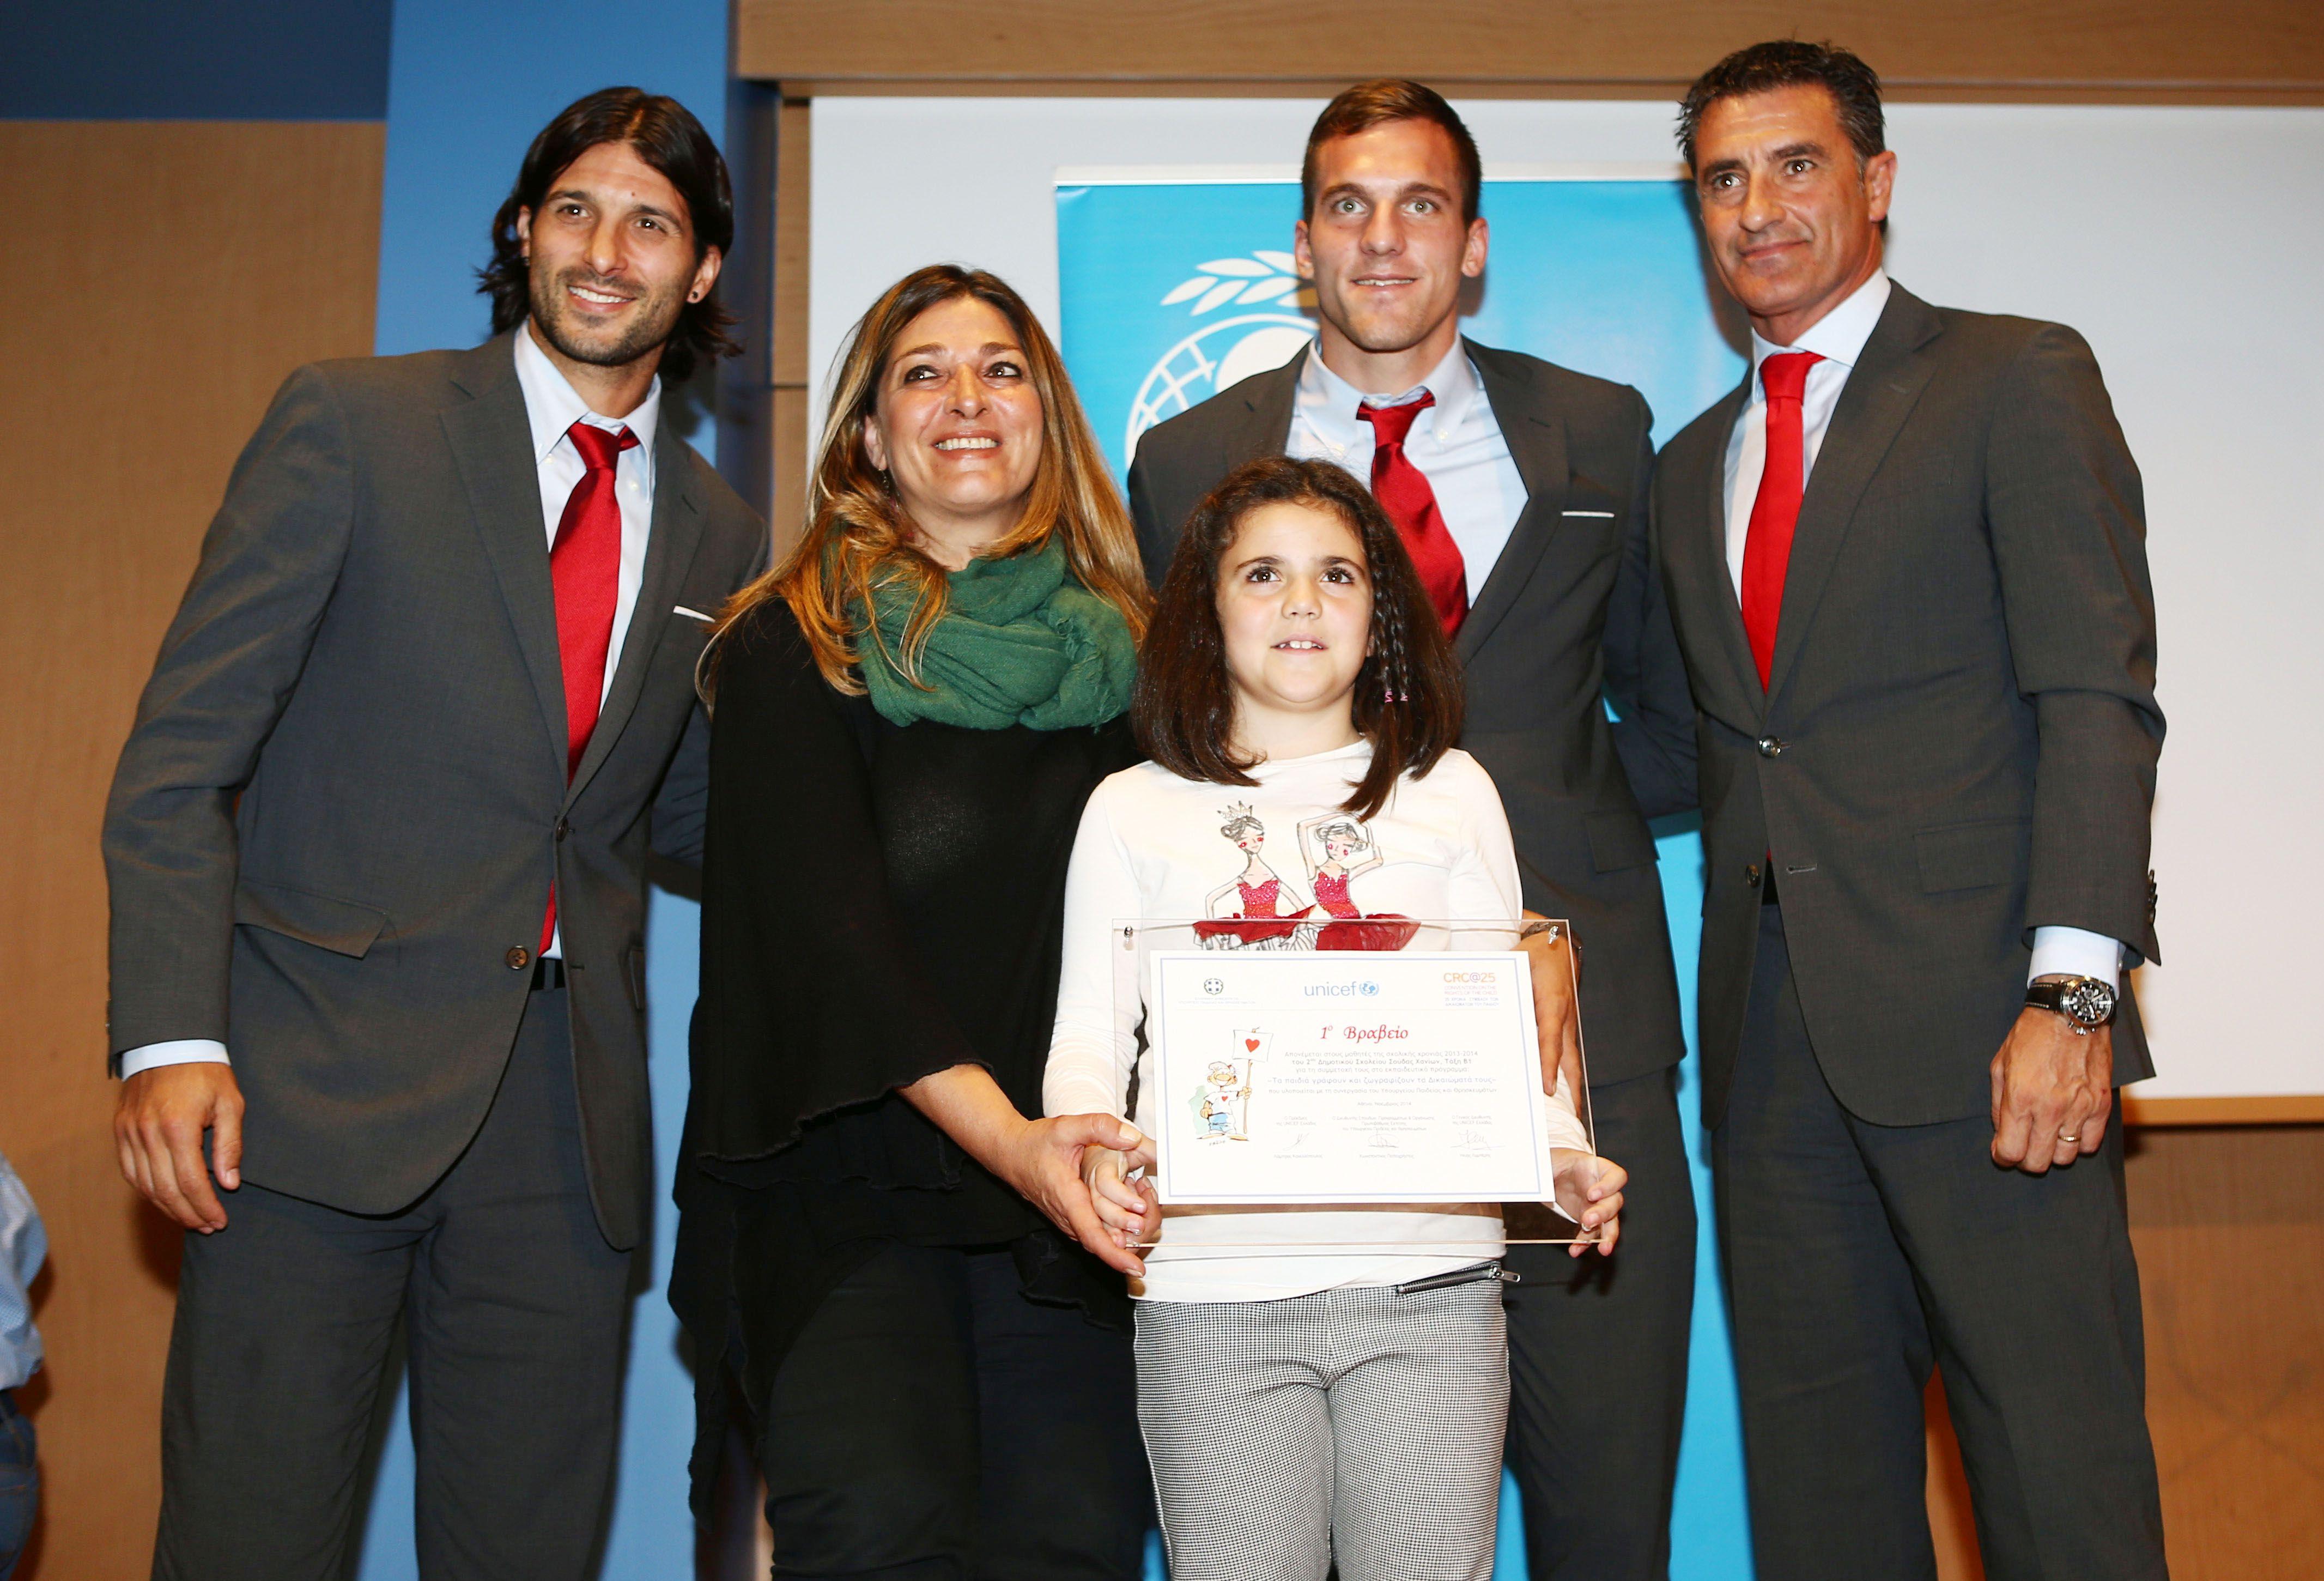 Olympiacos and UNICEF awarding children!